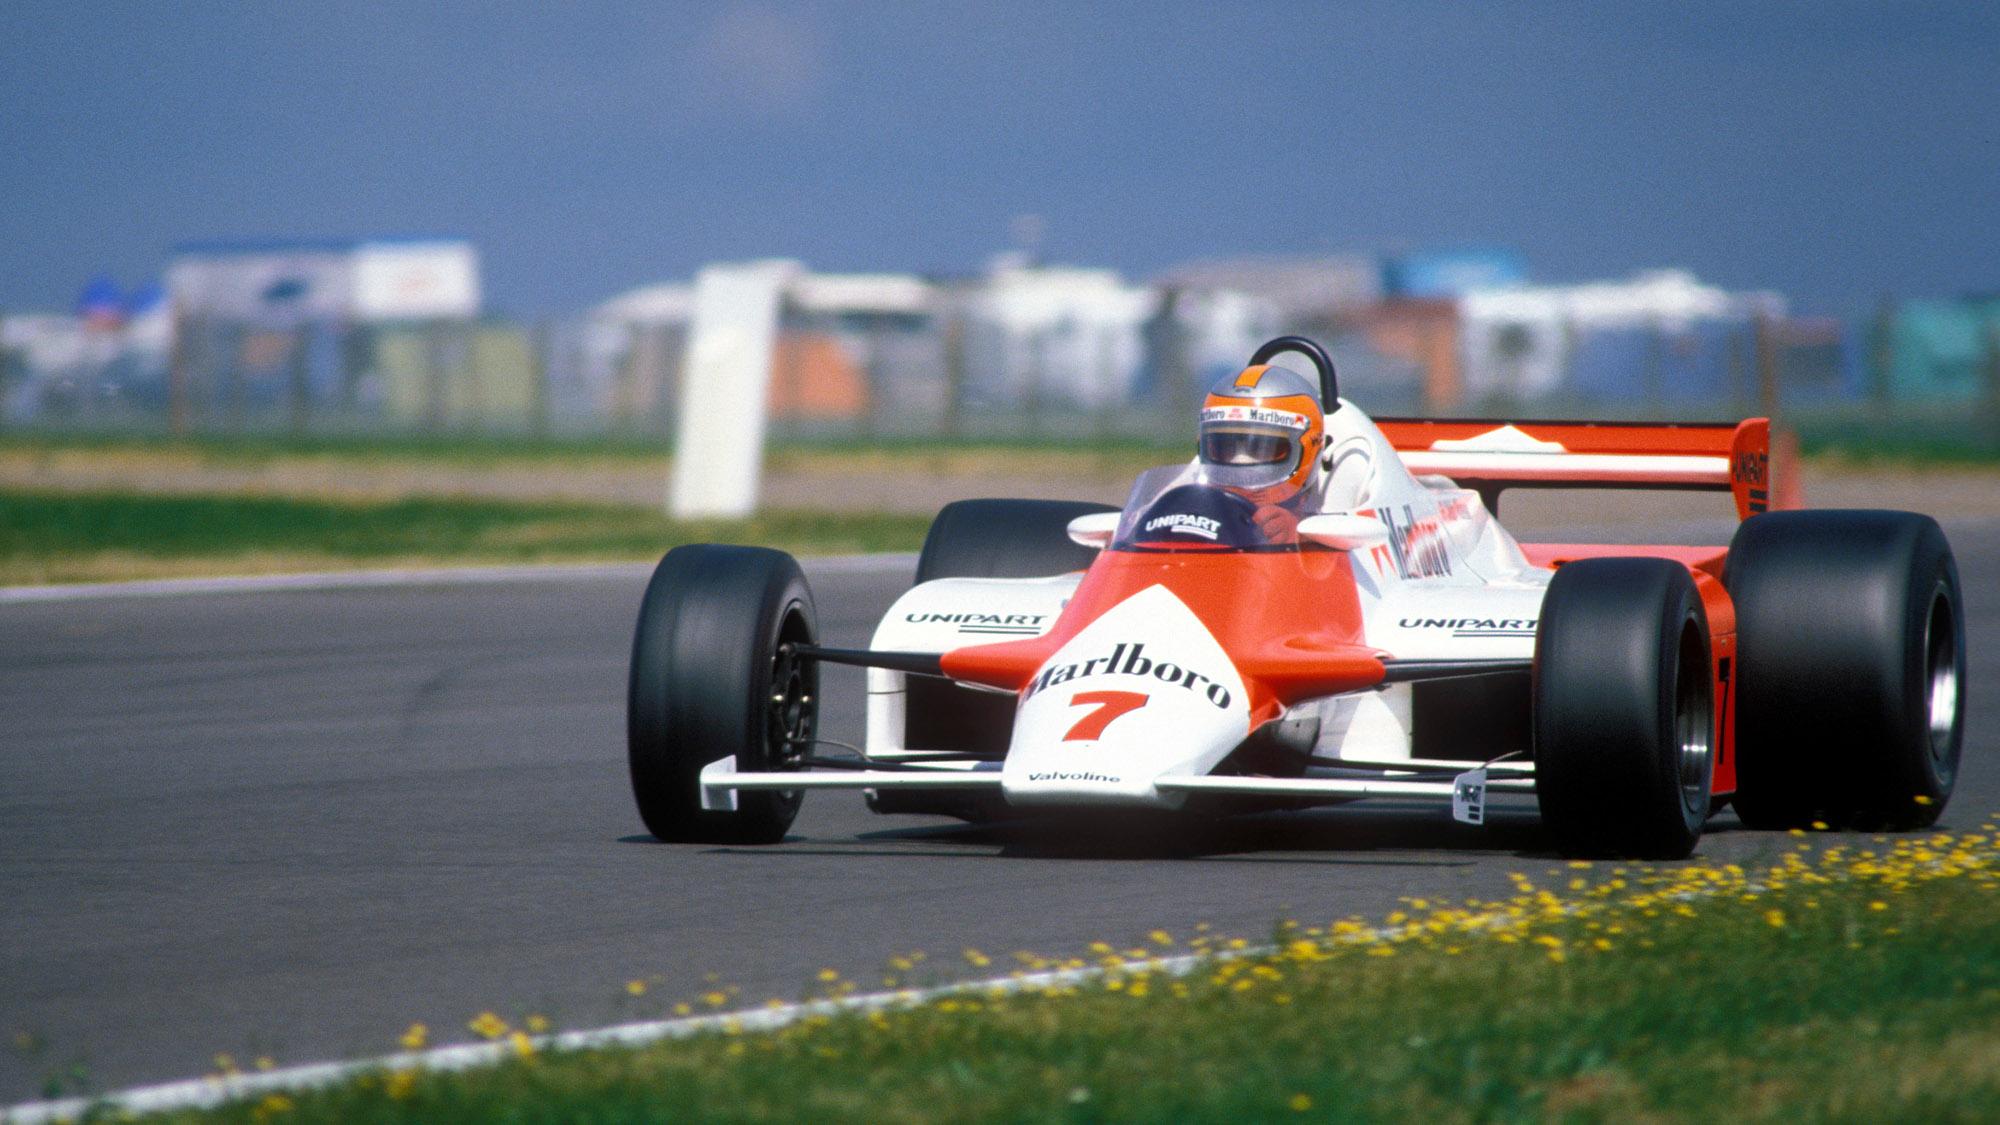 John Watson at the 1981 British Grand Prix